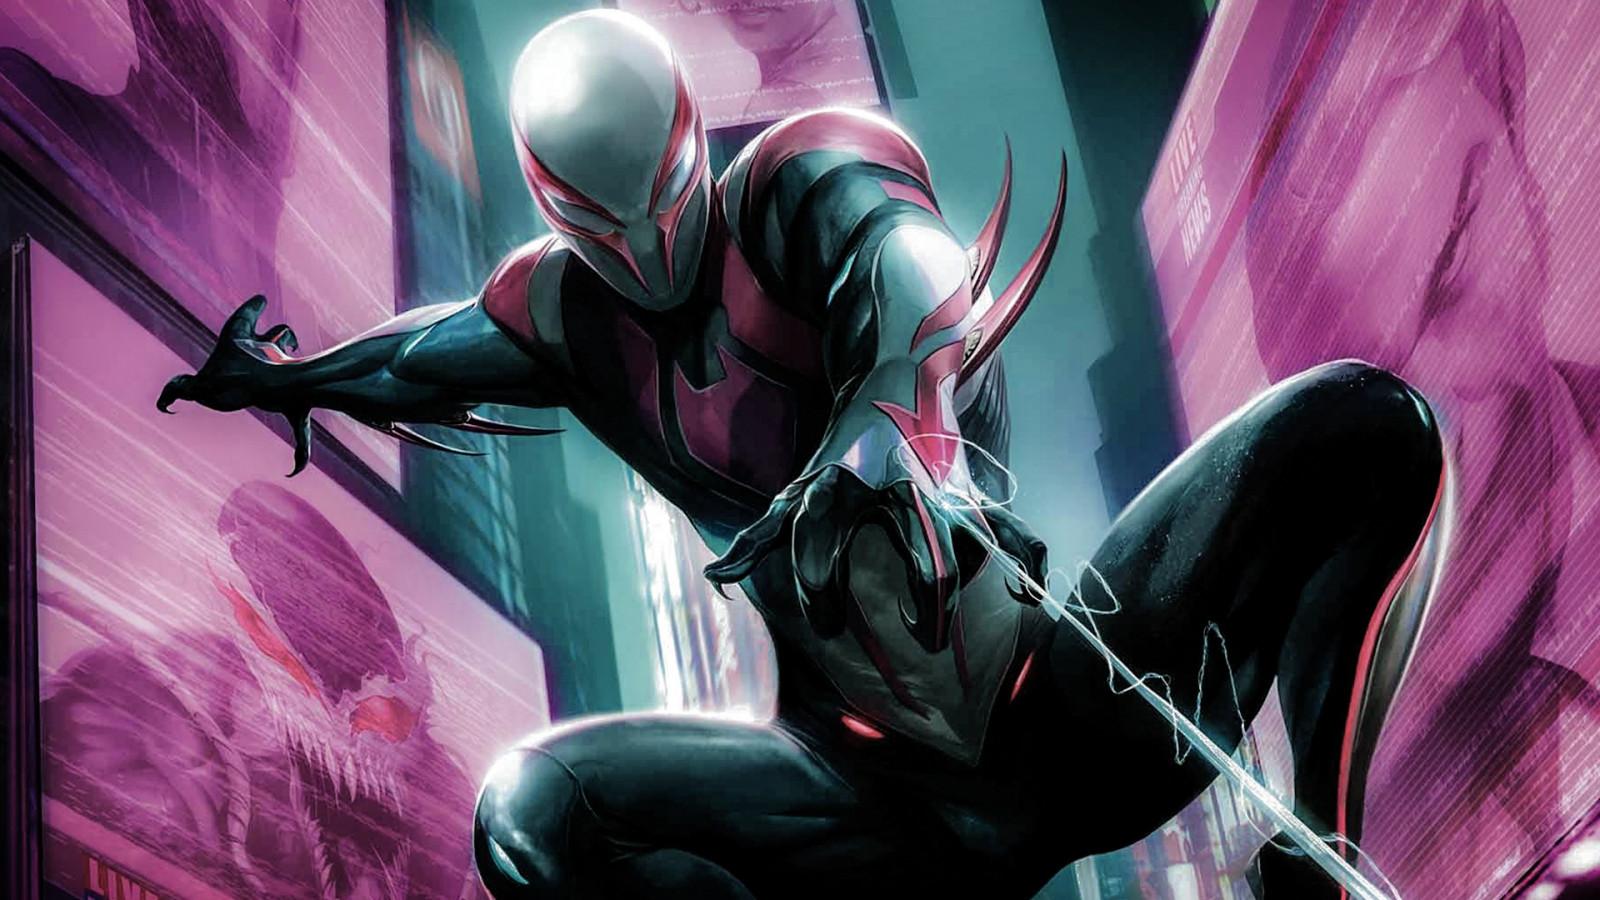 Spider Man 2099 Wallpaper On Wallpaperget Com